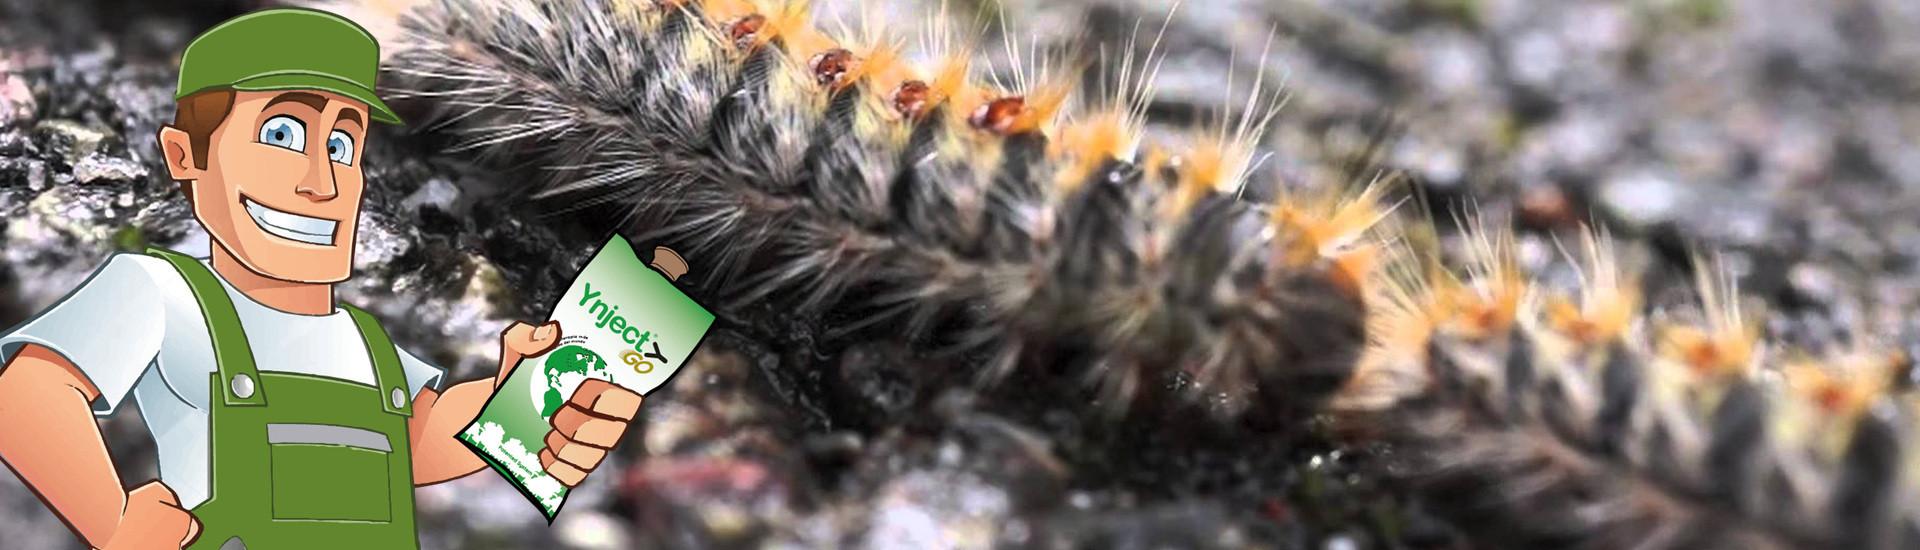 Endoterpia arbórea sistema fertinyect